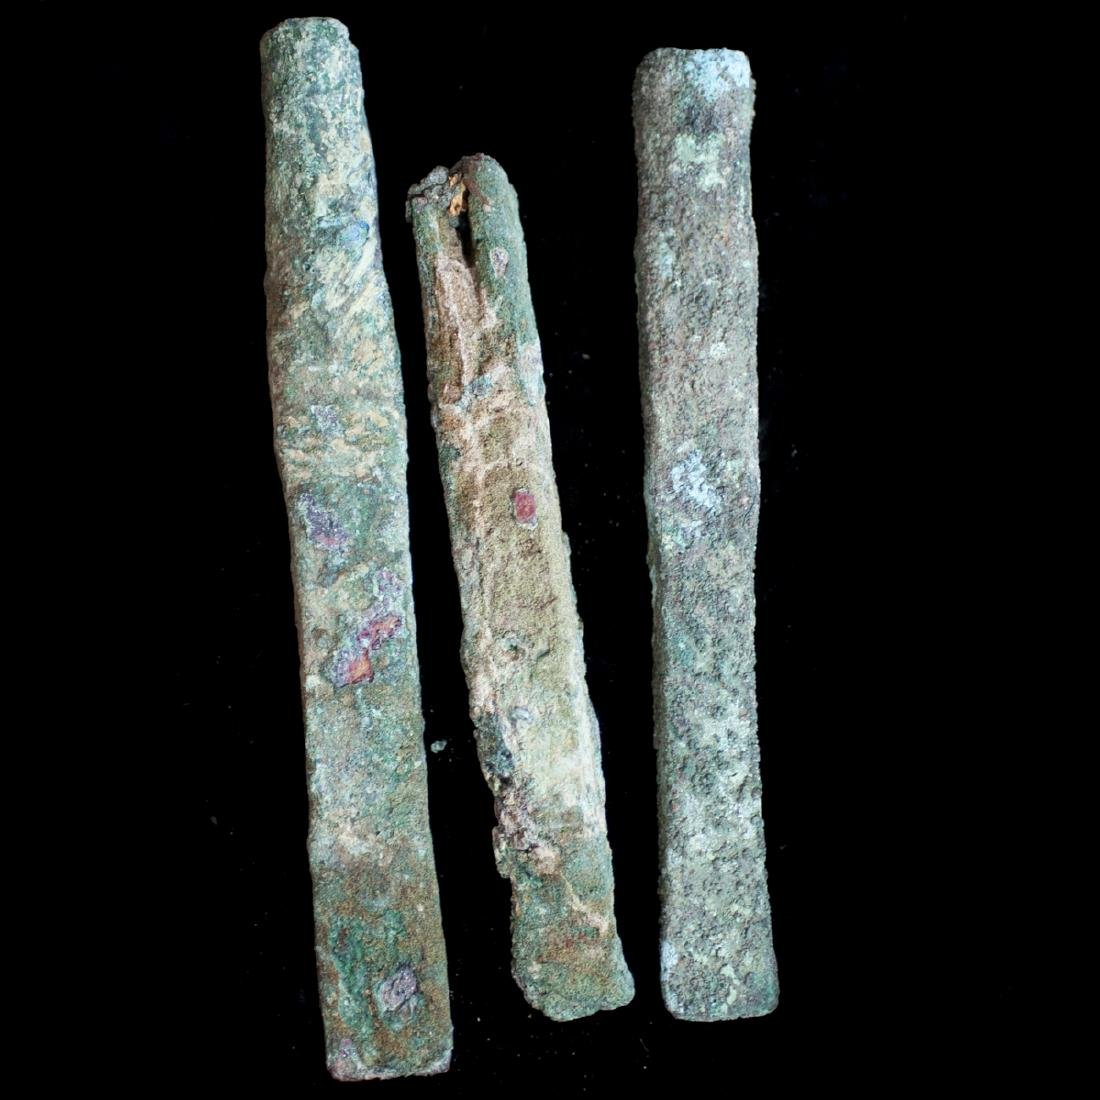 Pre-Columbian Copper Tool Fragments - 3